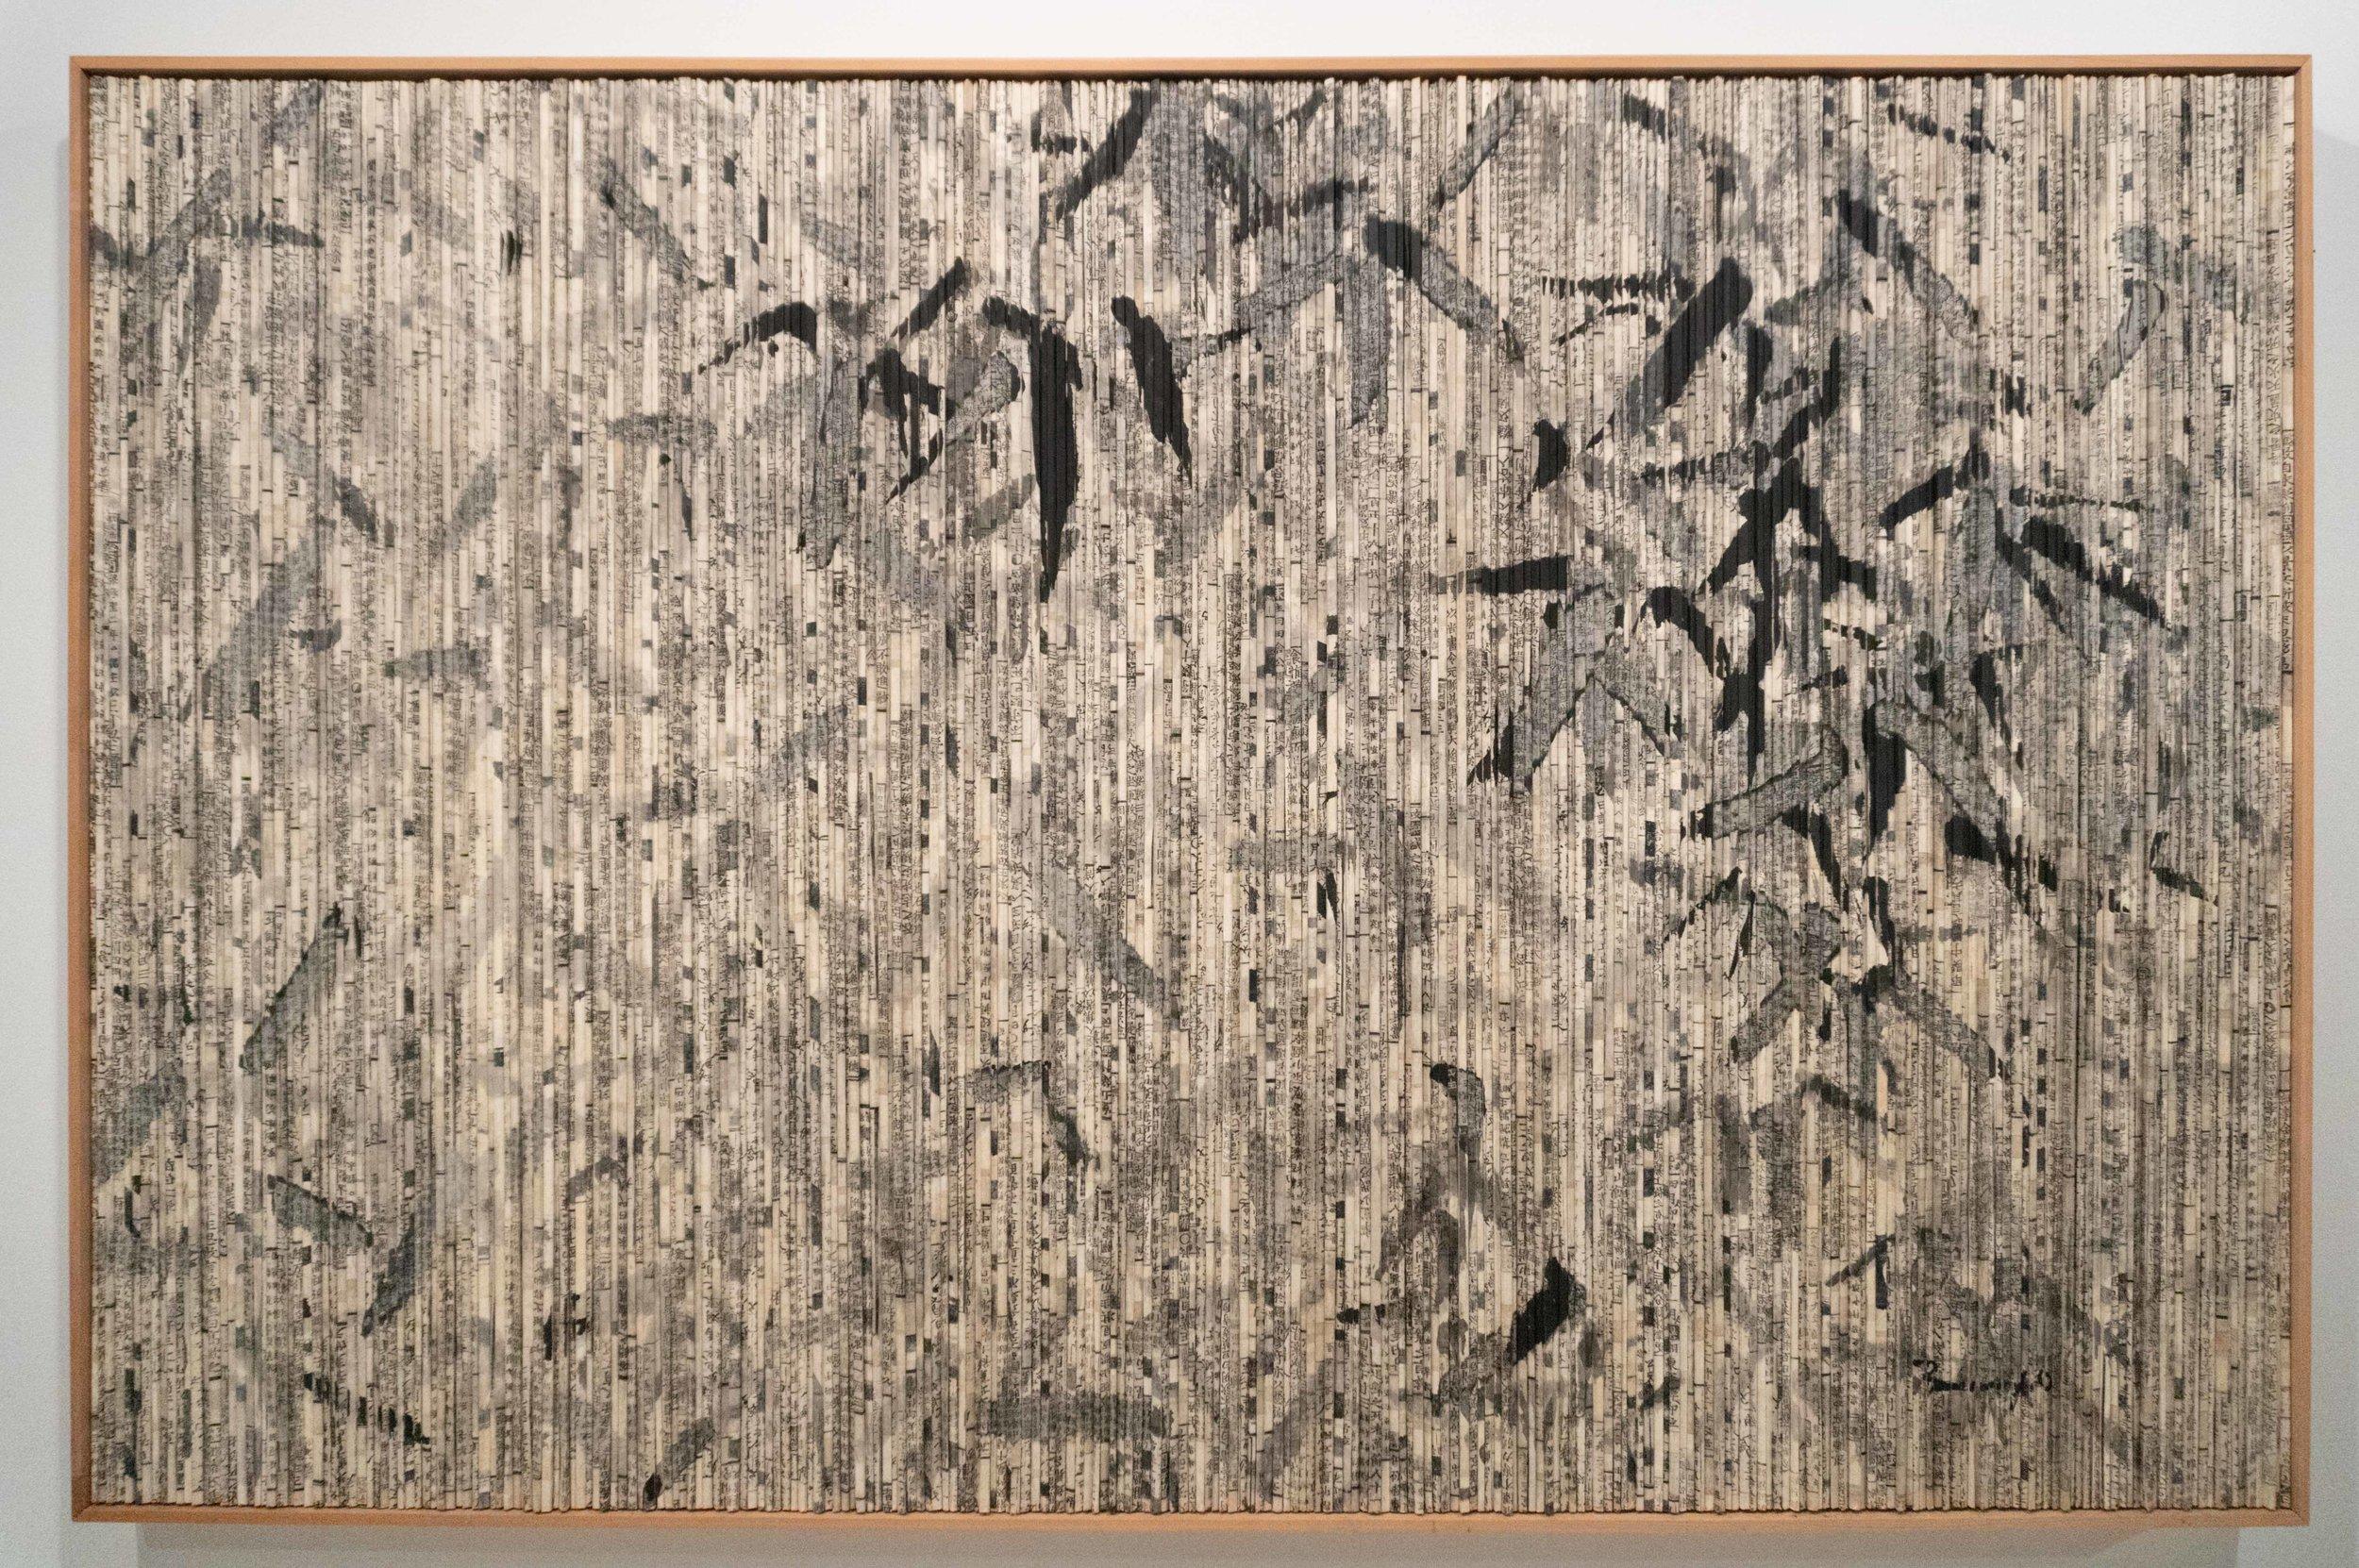 Jeong Gwang Hee 정광희 b. 1971   In the Bamboo Forest-2 대숲에서-2 2012 Ink on Hanji paper 51 x 78 ¾ in